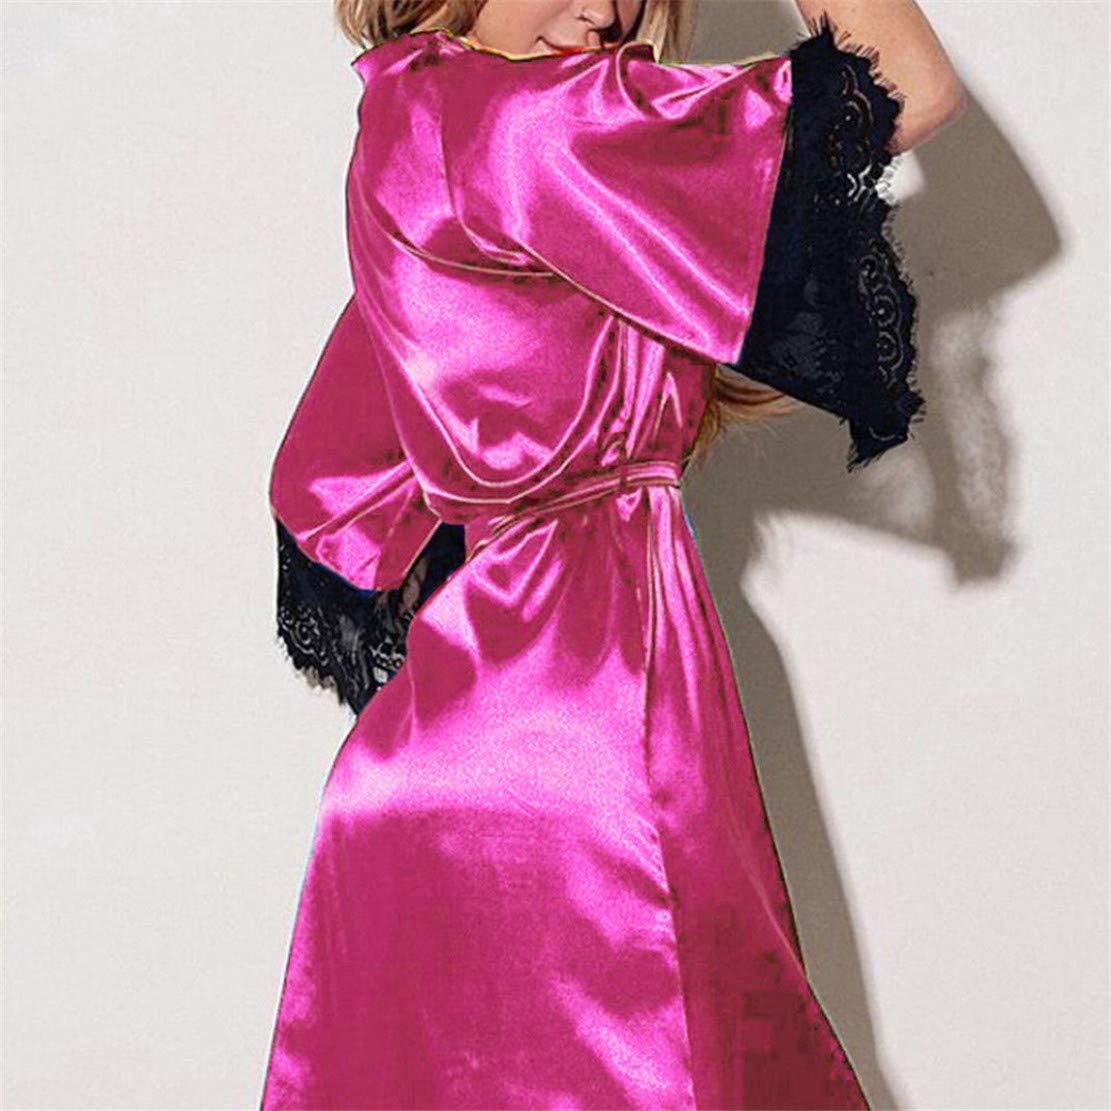 Amazon.com: DORIC Women Sexy Silk Kimono Dressing Babydoll Lace Lingerie Belt Bath Robe Nightwear: Clothing